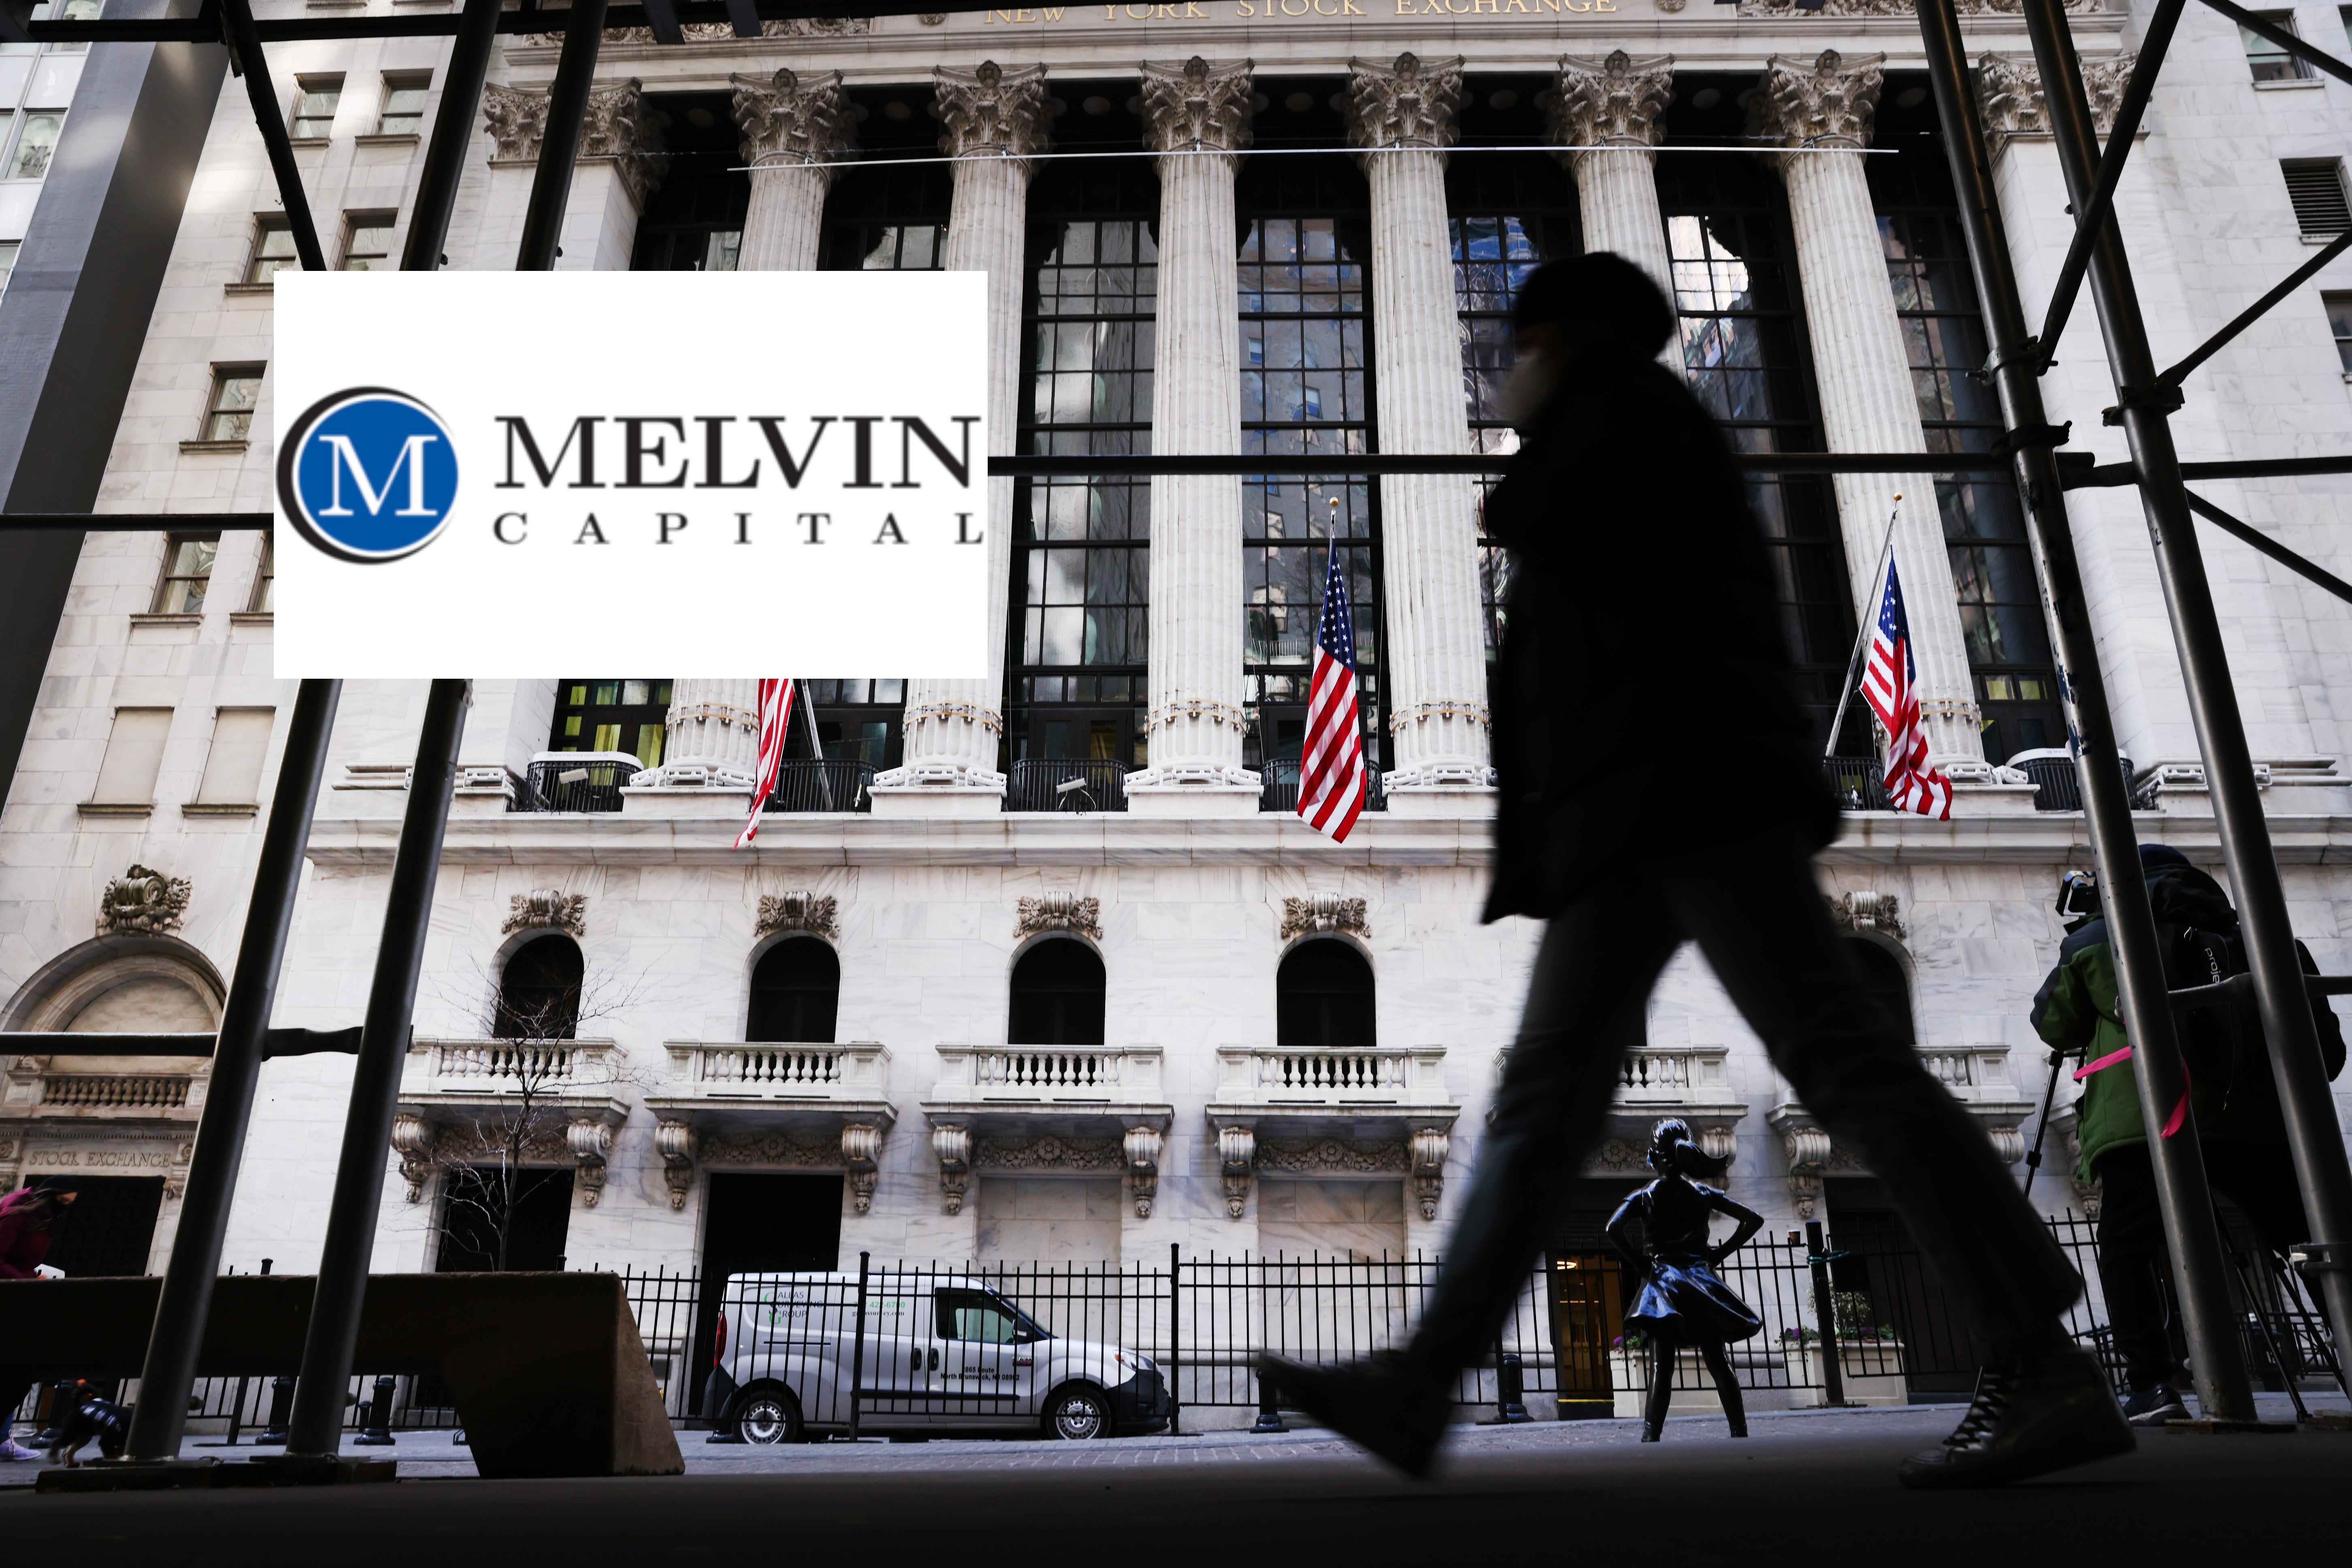 Melvin Capital hedge fund